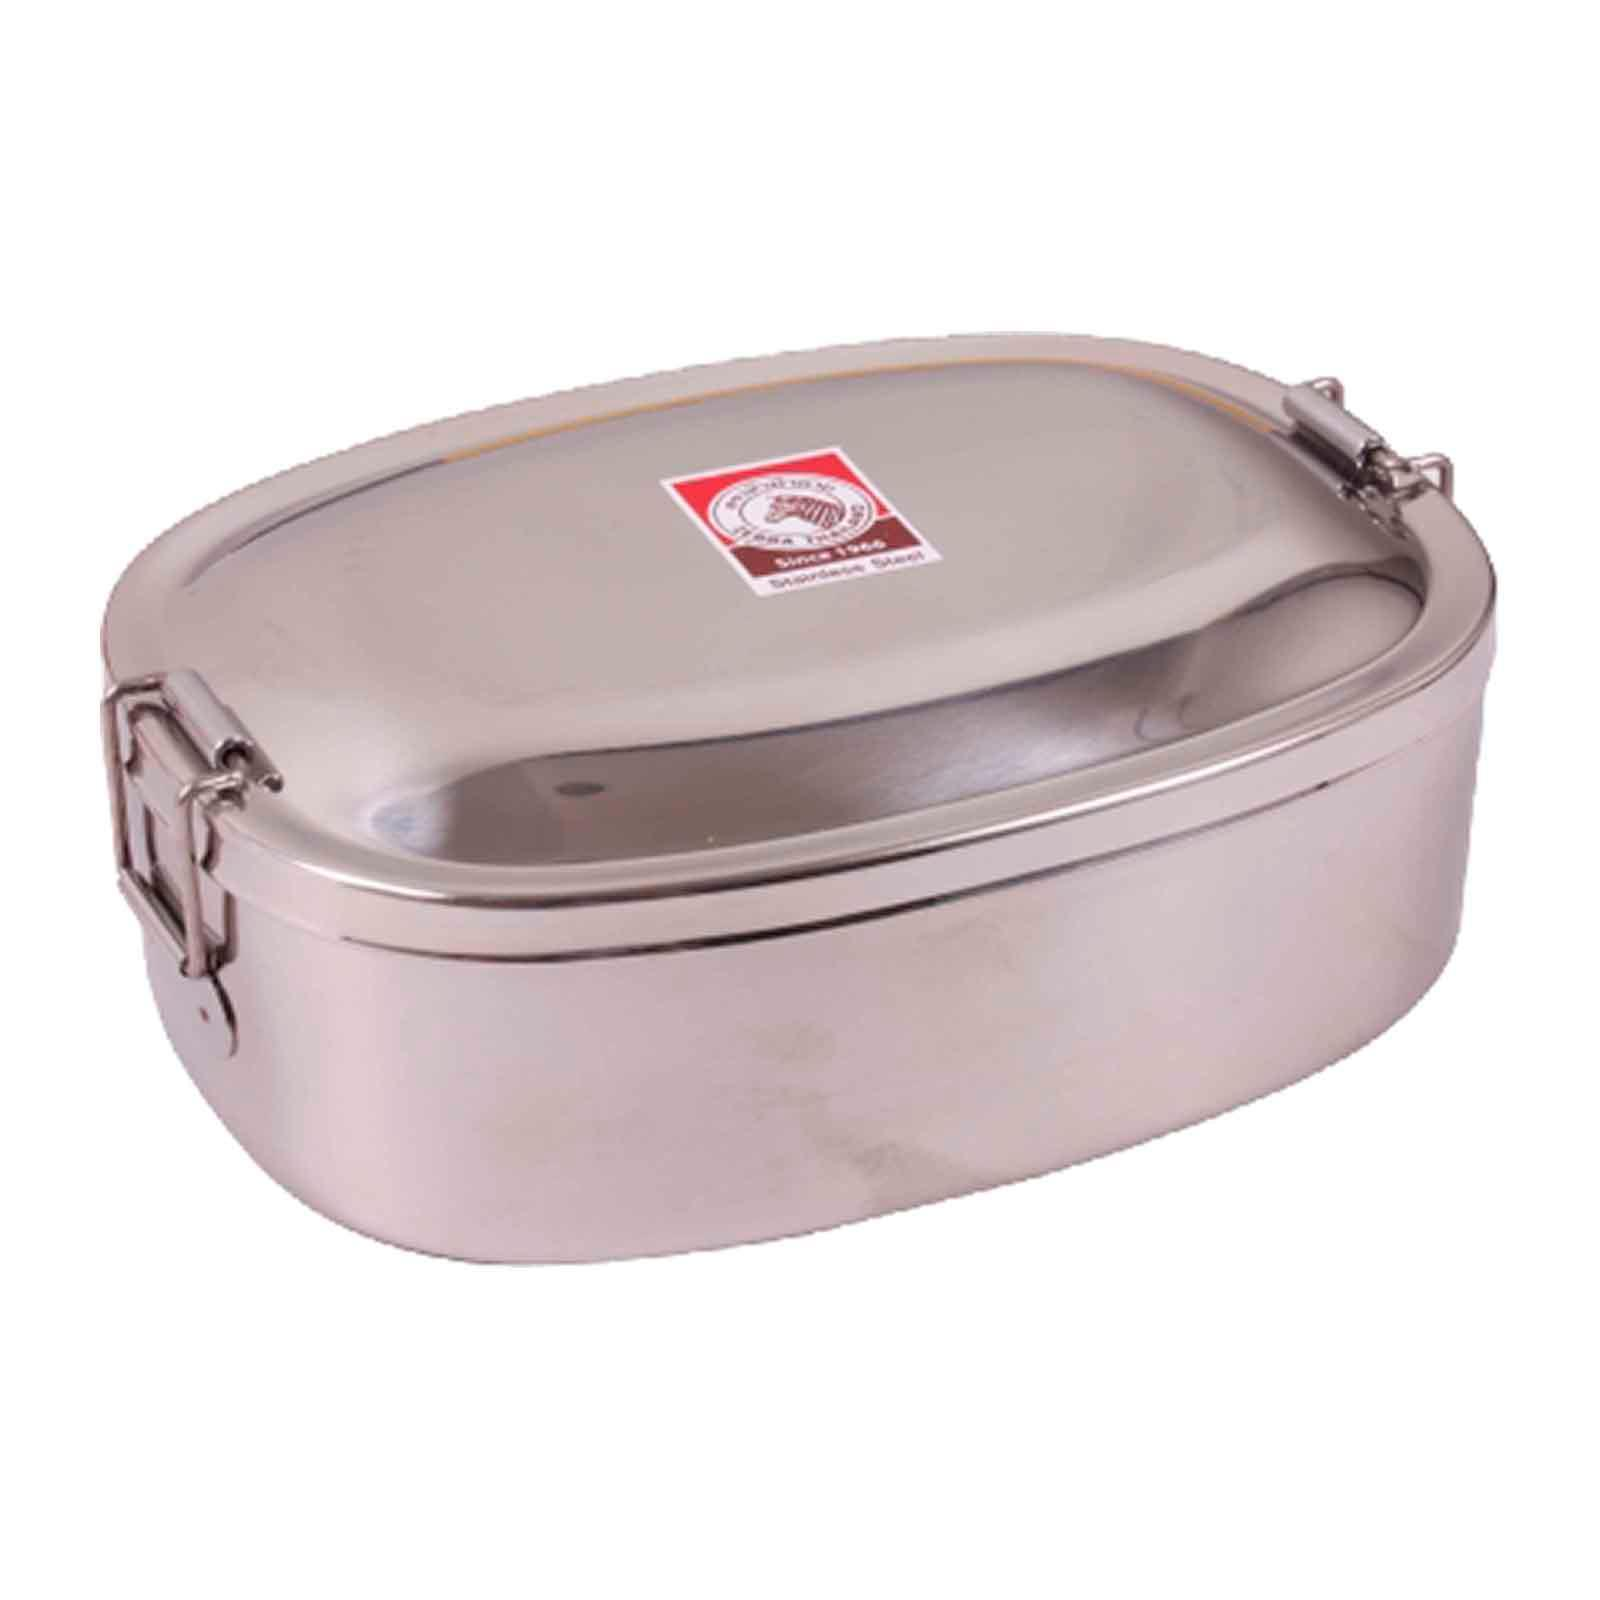 Zebra Stainless Steel Lunch Box 15Cm - By ToTT